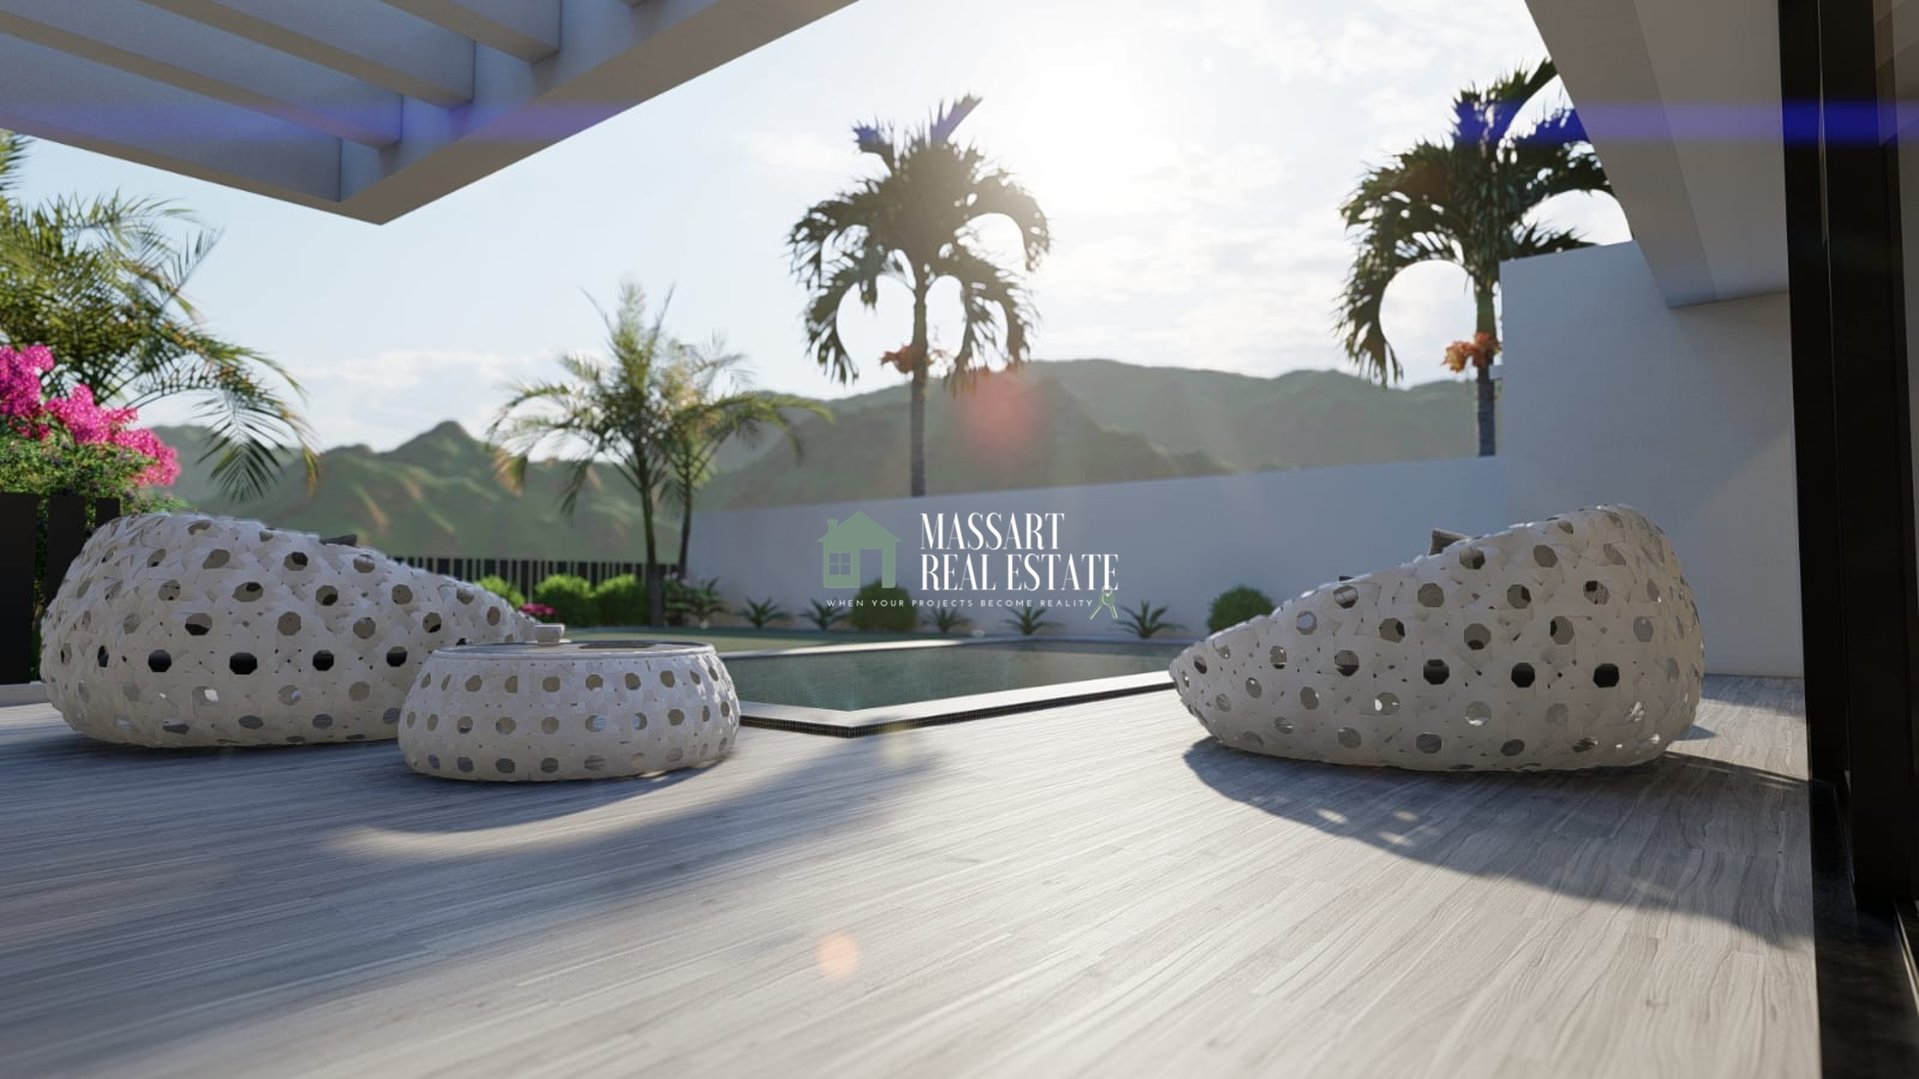 Une villa moderne et luxueuse au design exclusif - Granadilla de Abona.